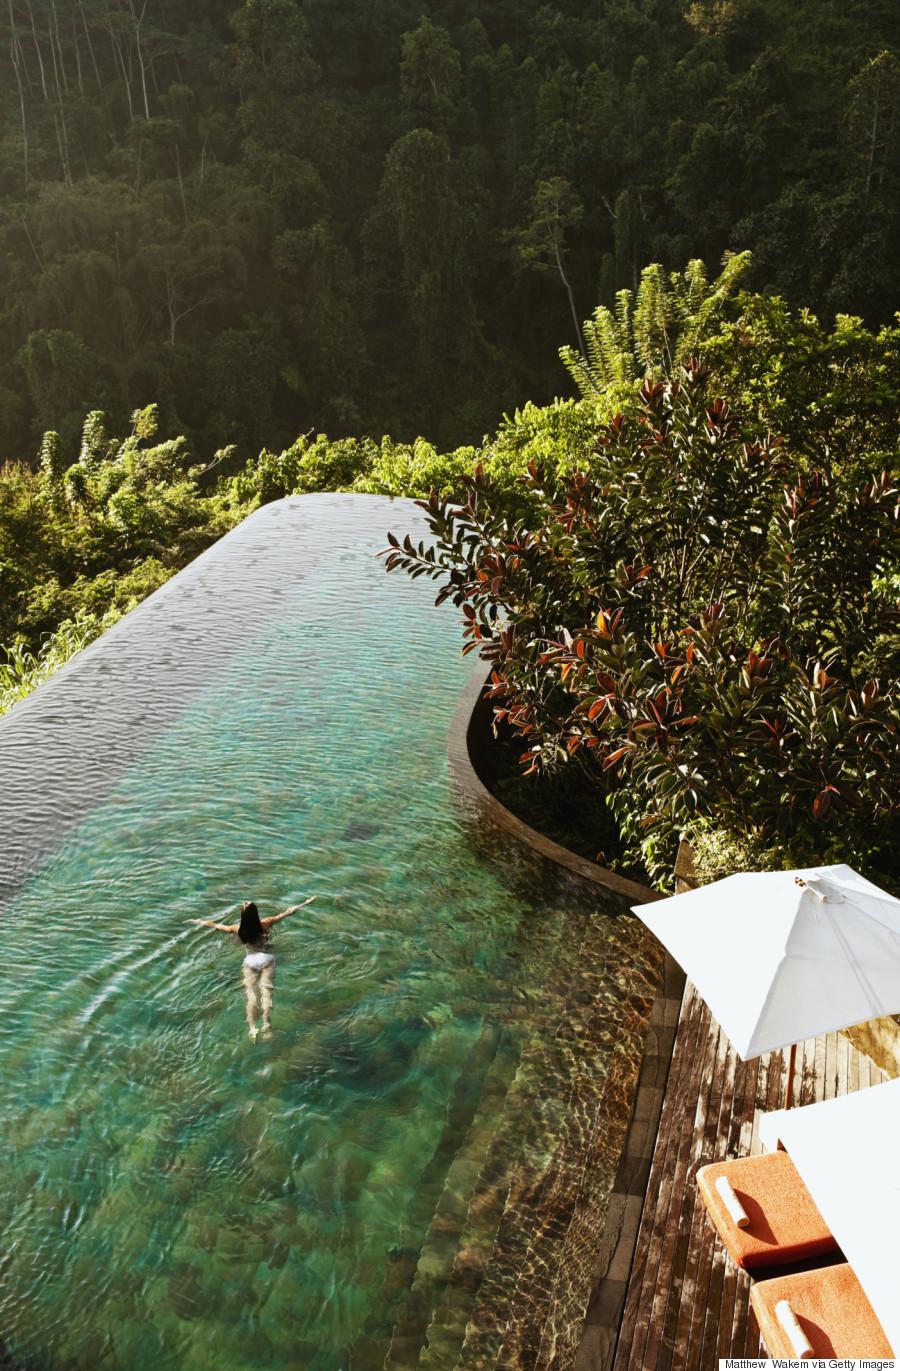 4. Hanging Gardens Ubud in Bali, Indonesia